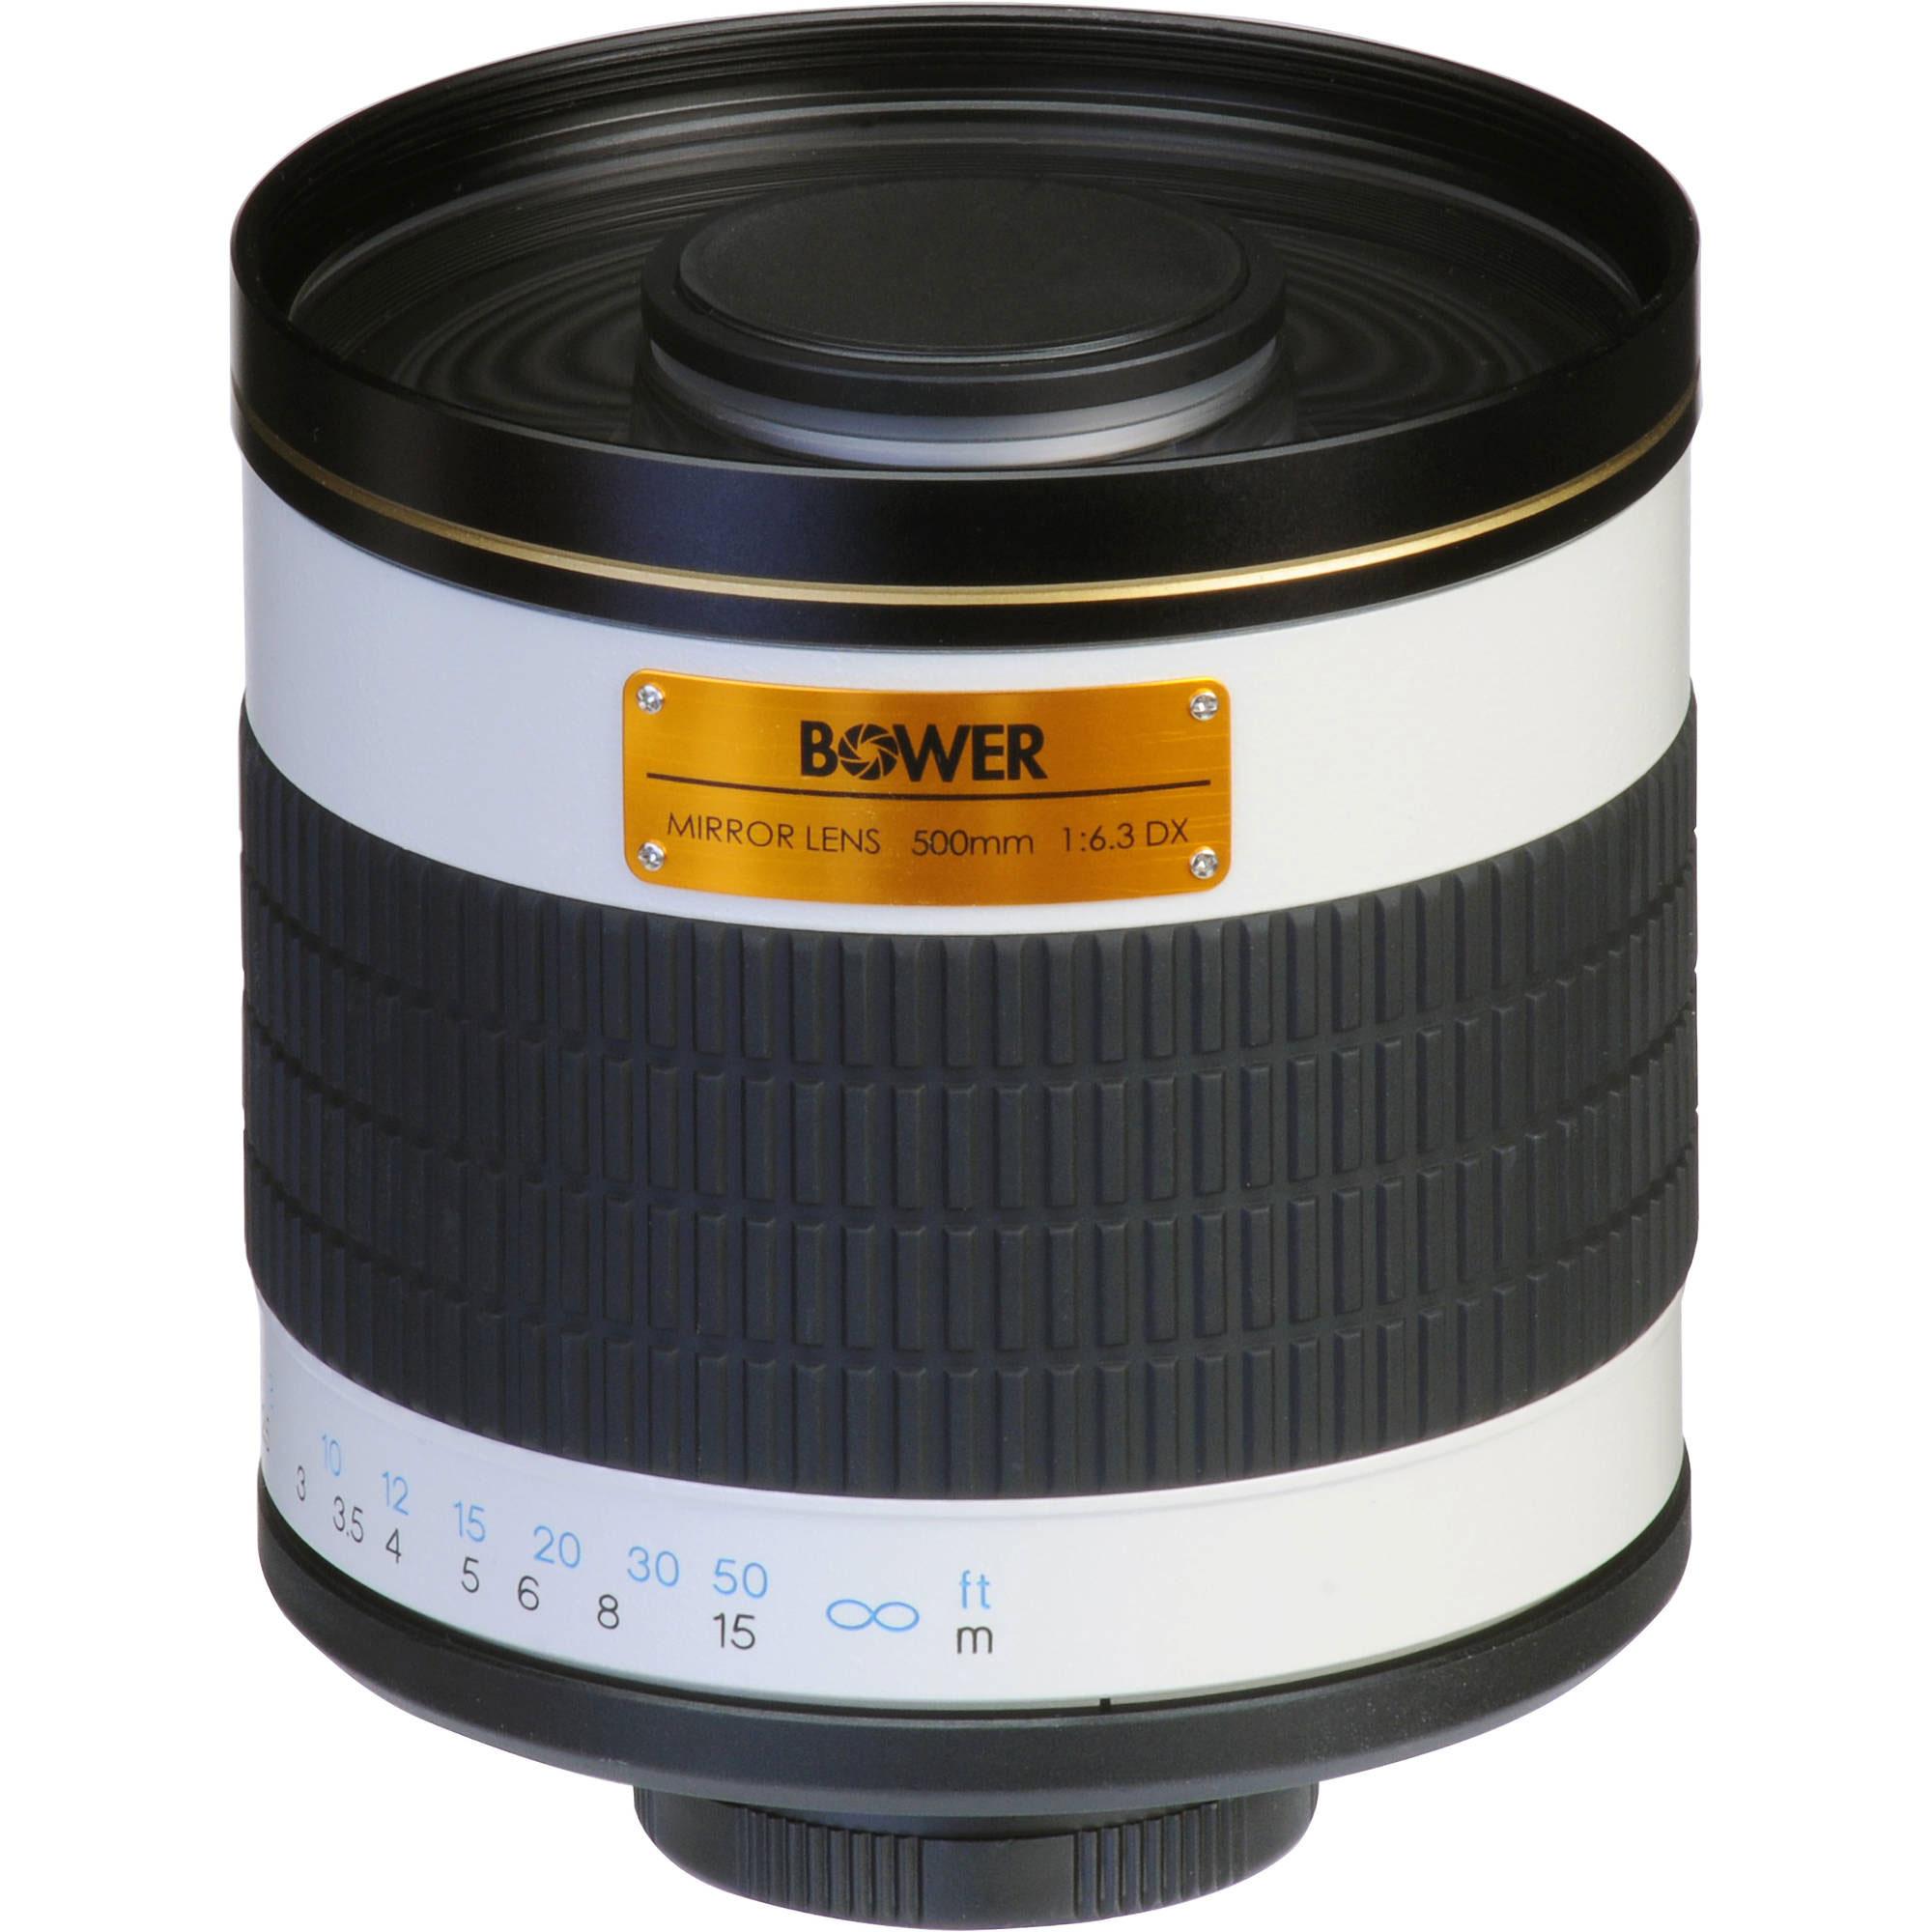 Bower 500mm f/6.3 DX Mirror Lens